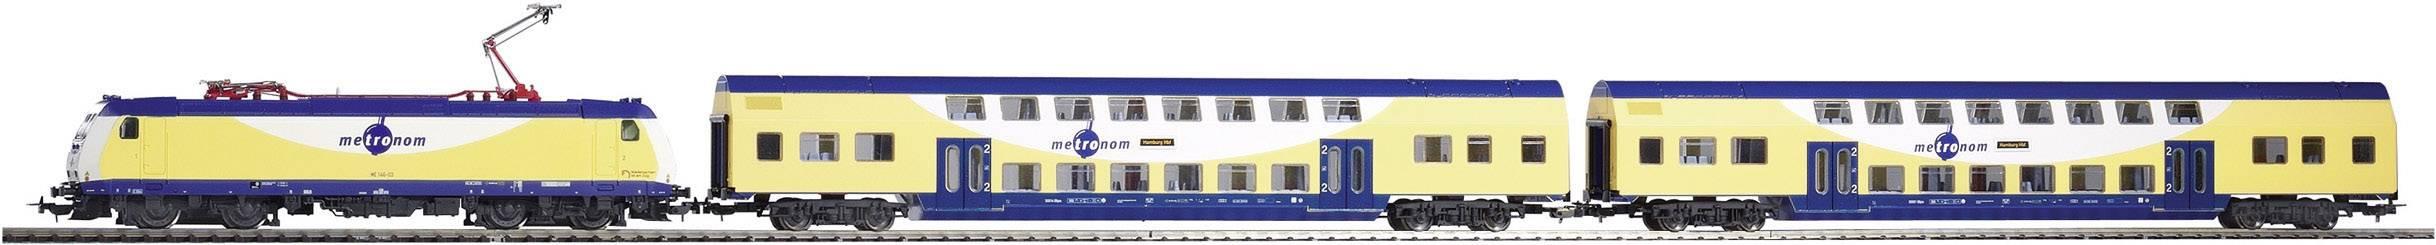 Startovací sada H0 osobního vlaku Metronom a elektrické lokomotivy řady 146 Piko